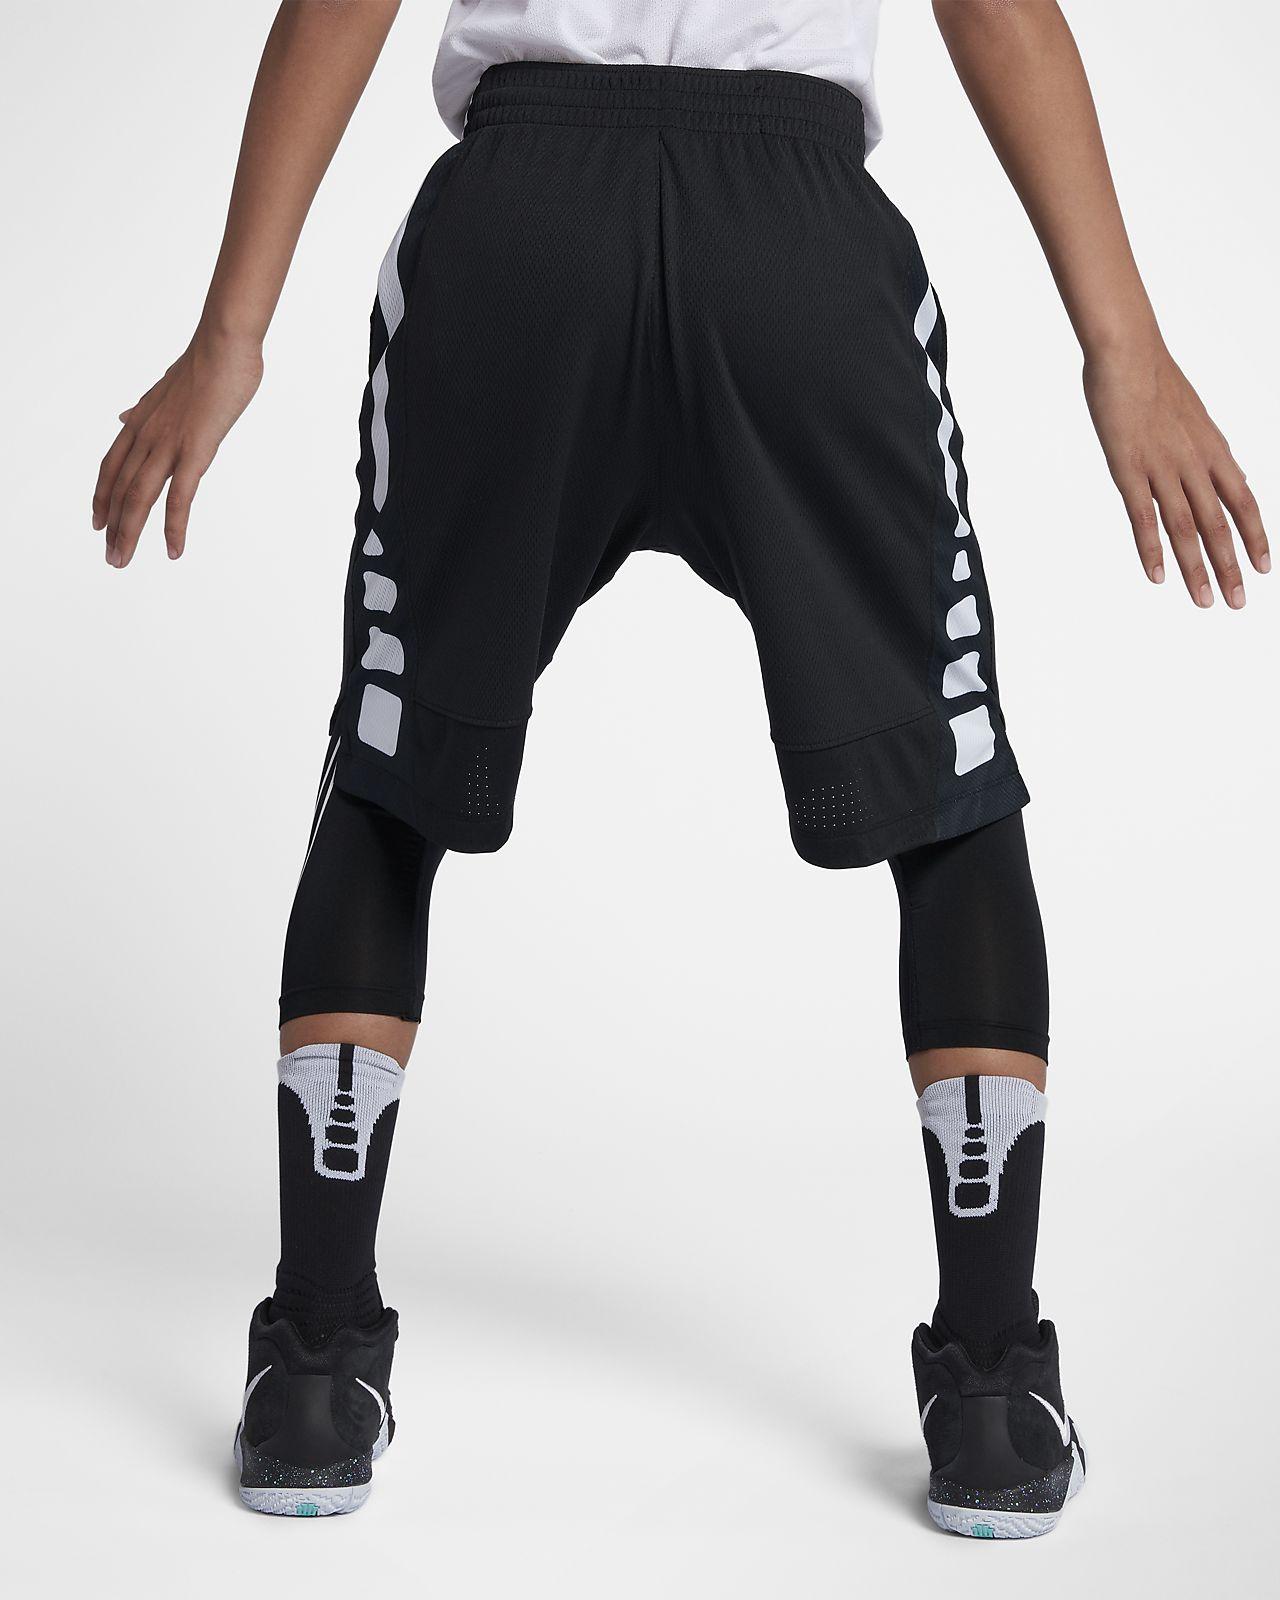 1d59a0e5d0f85d Nike Dri-FIT Elite Big Kids  (Boys ) Basketball Shorts. Nike.com